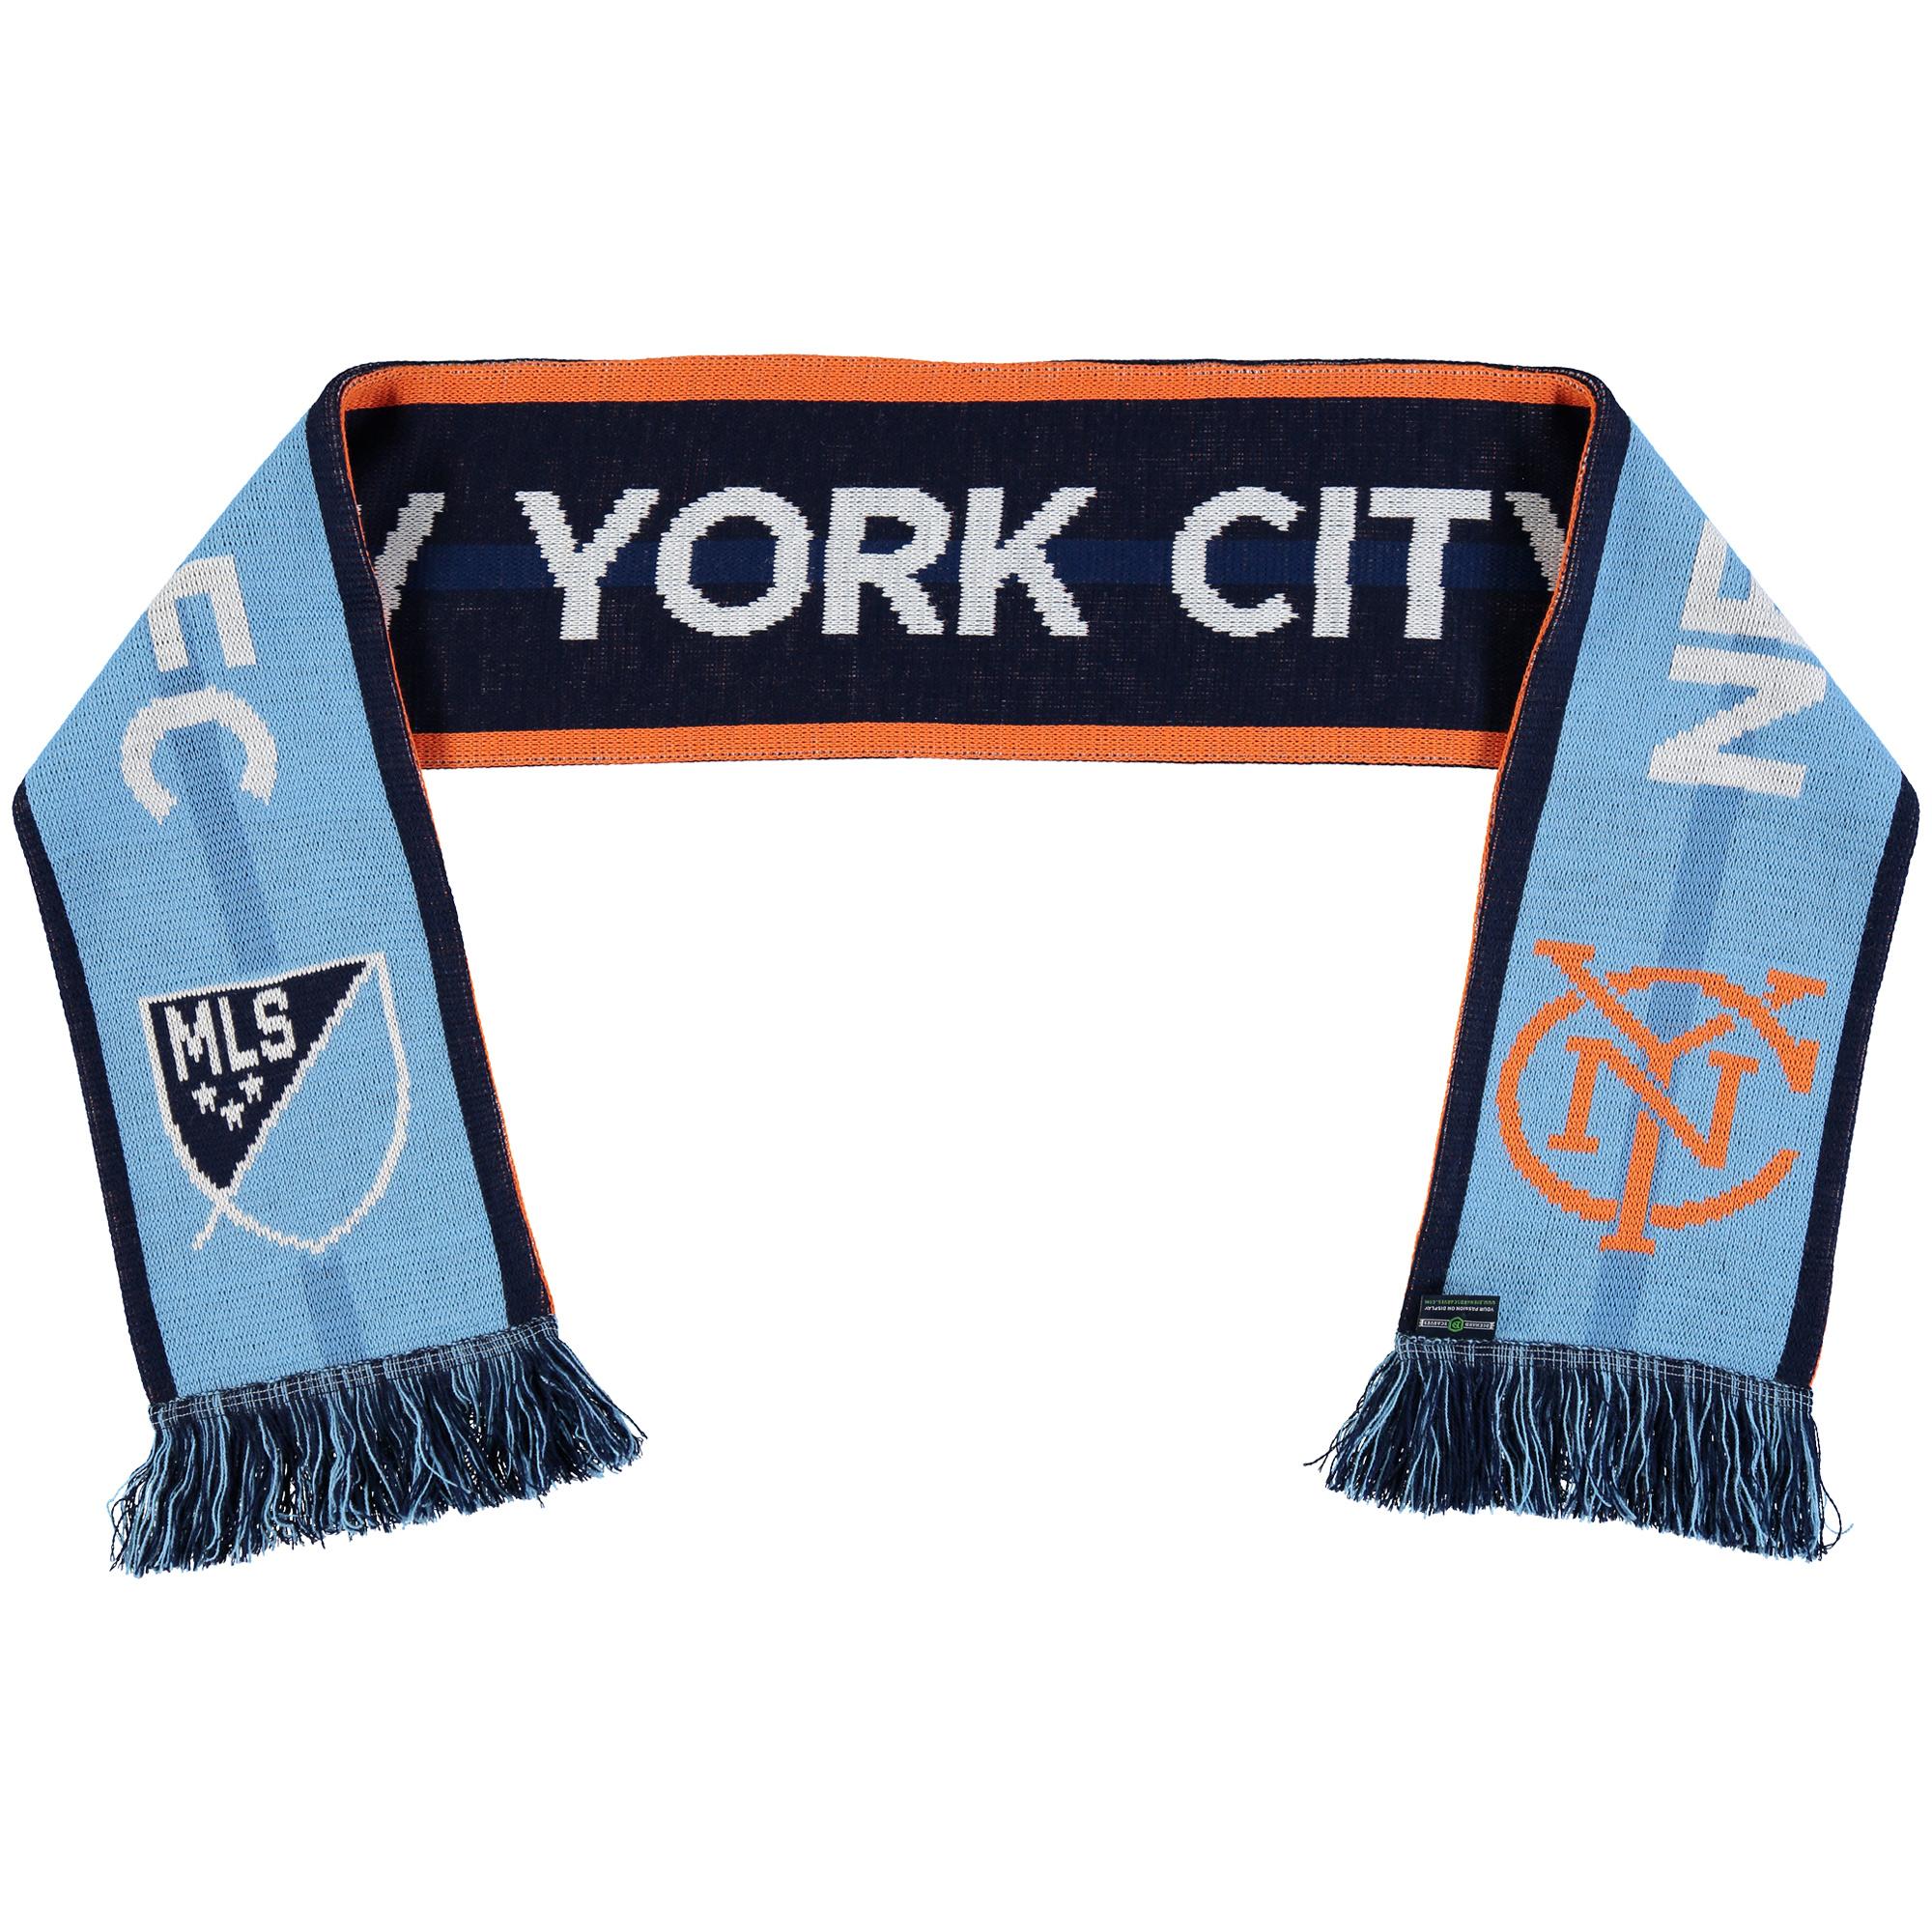 New York City FC Team Pride Scarf - Light Blue/Blue - No Size